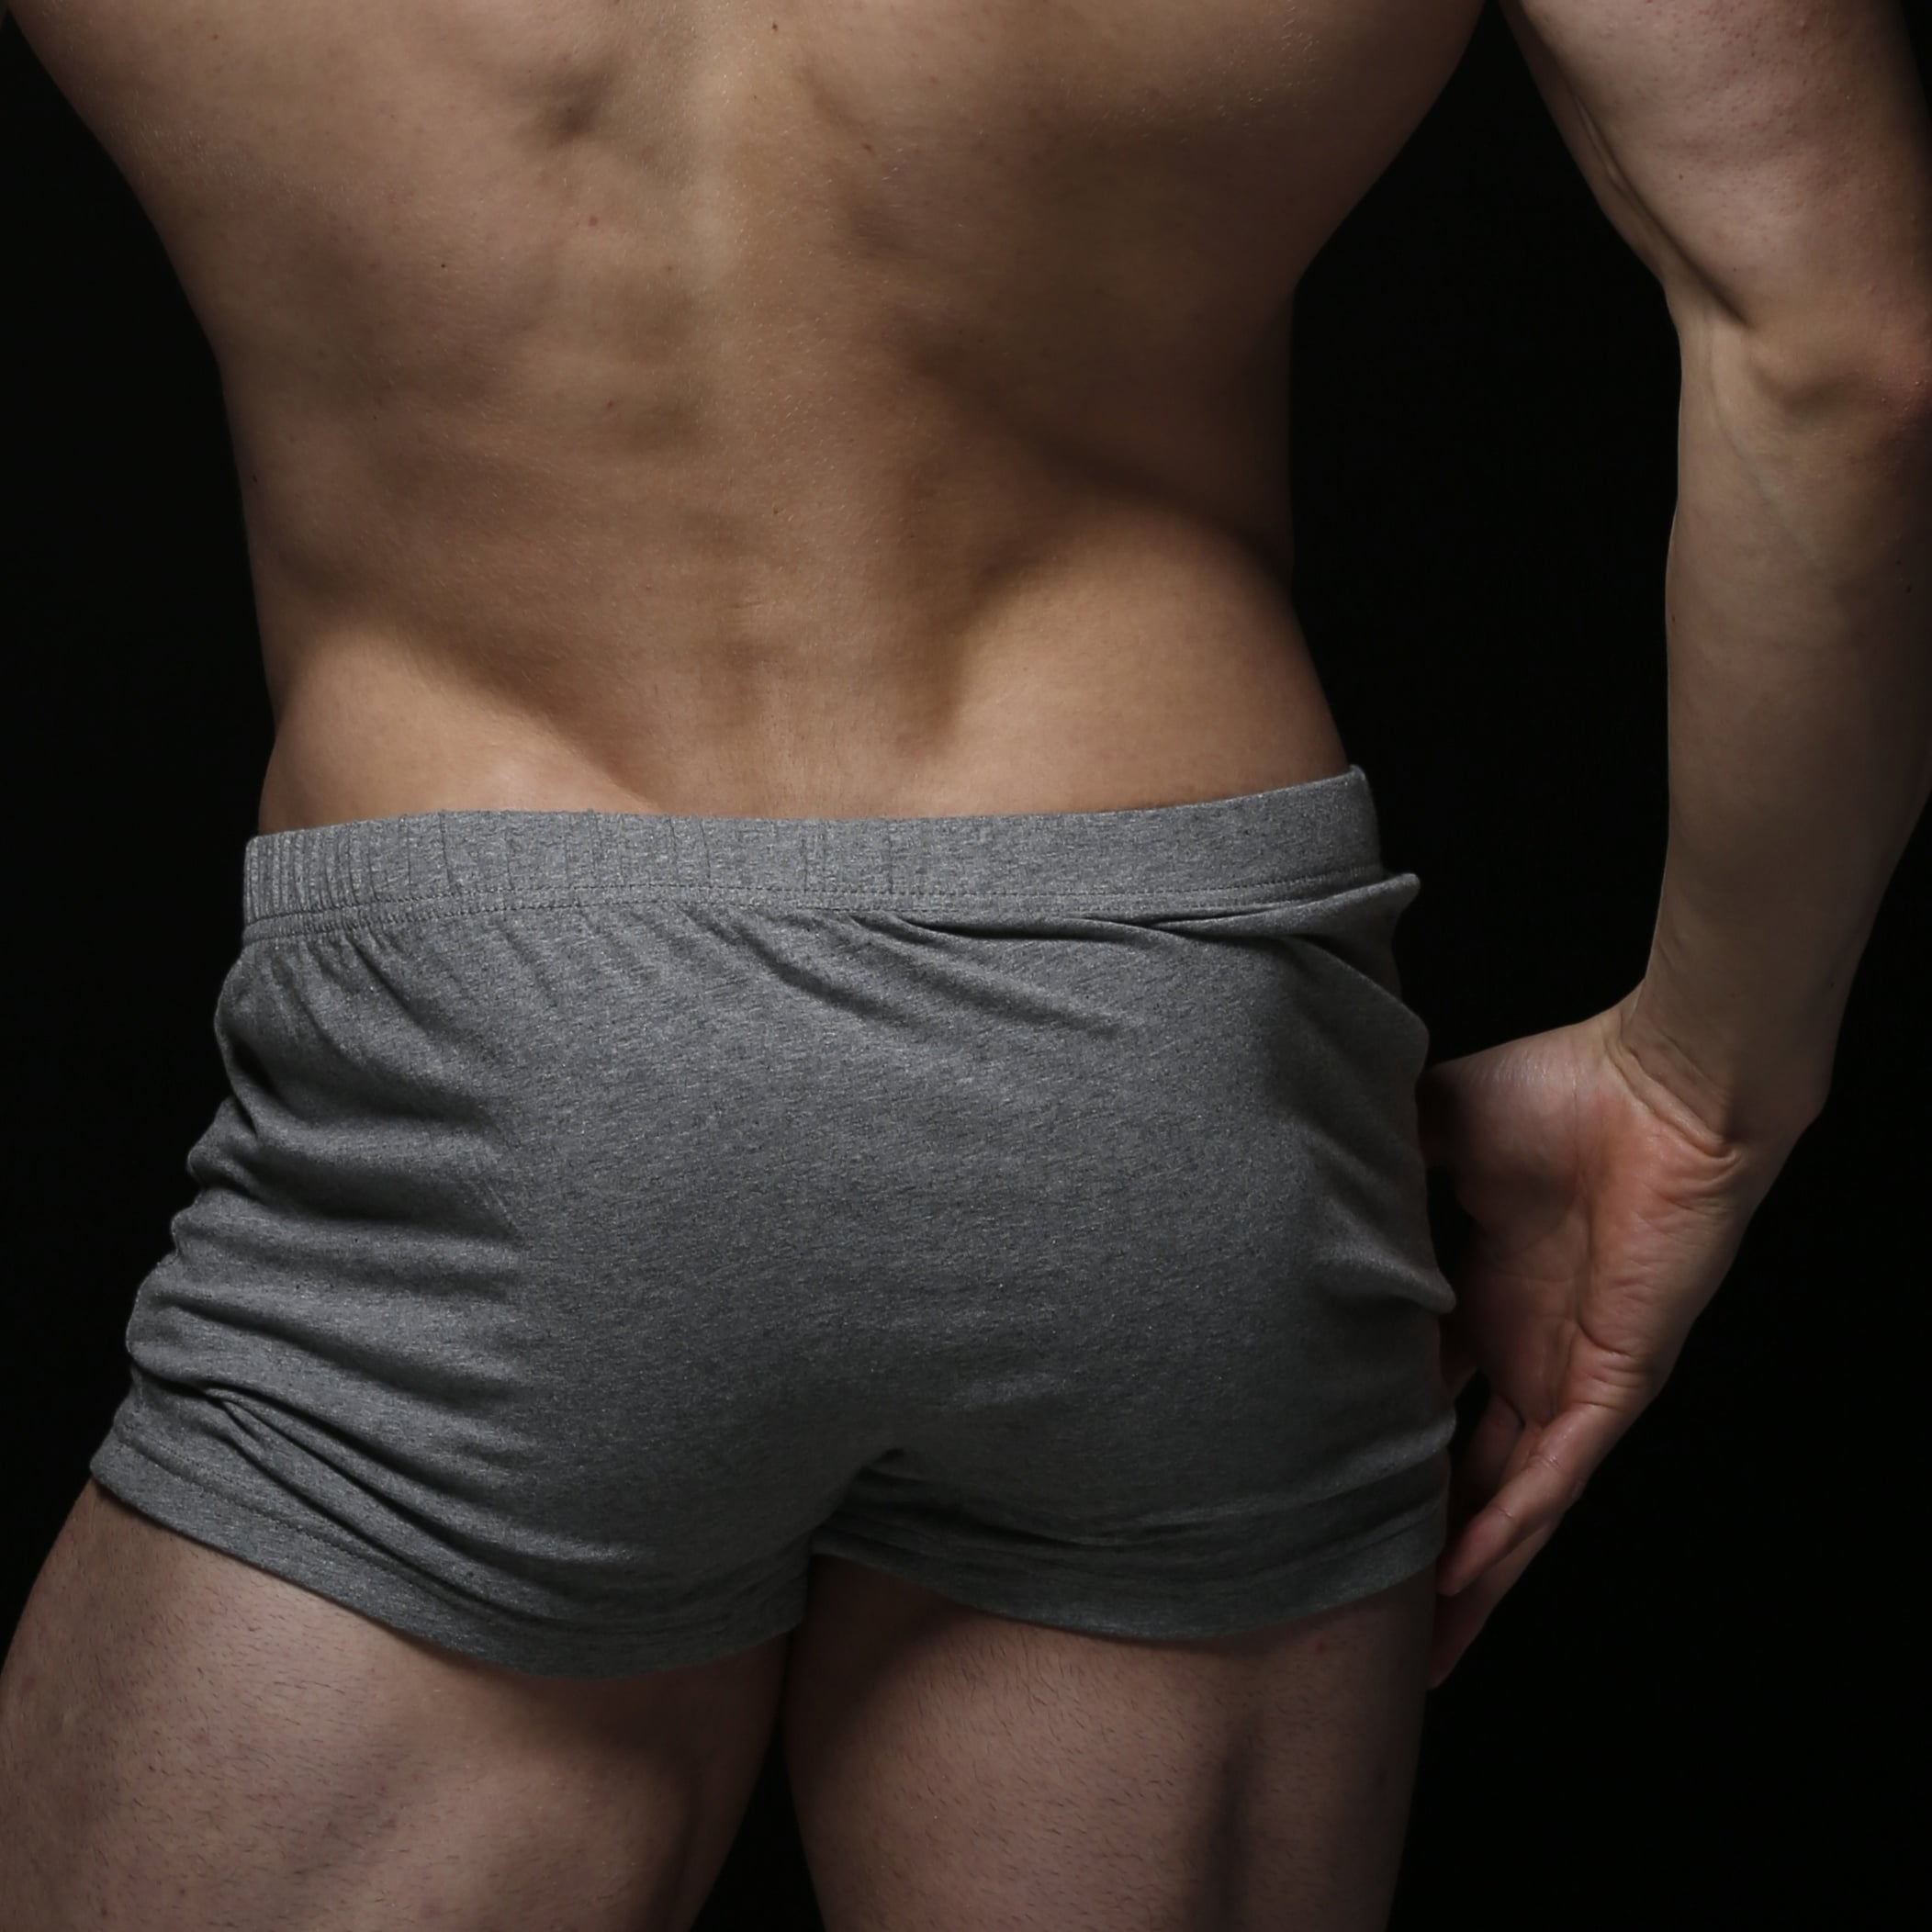 zlc-grey-boxer-back-closeup